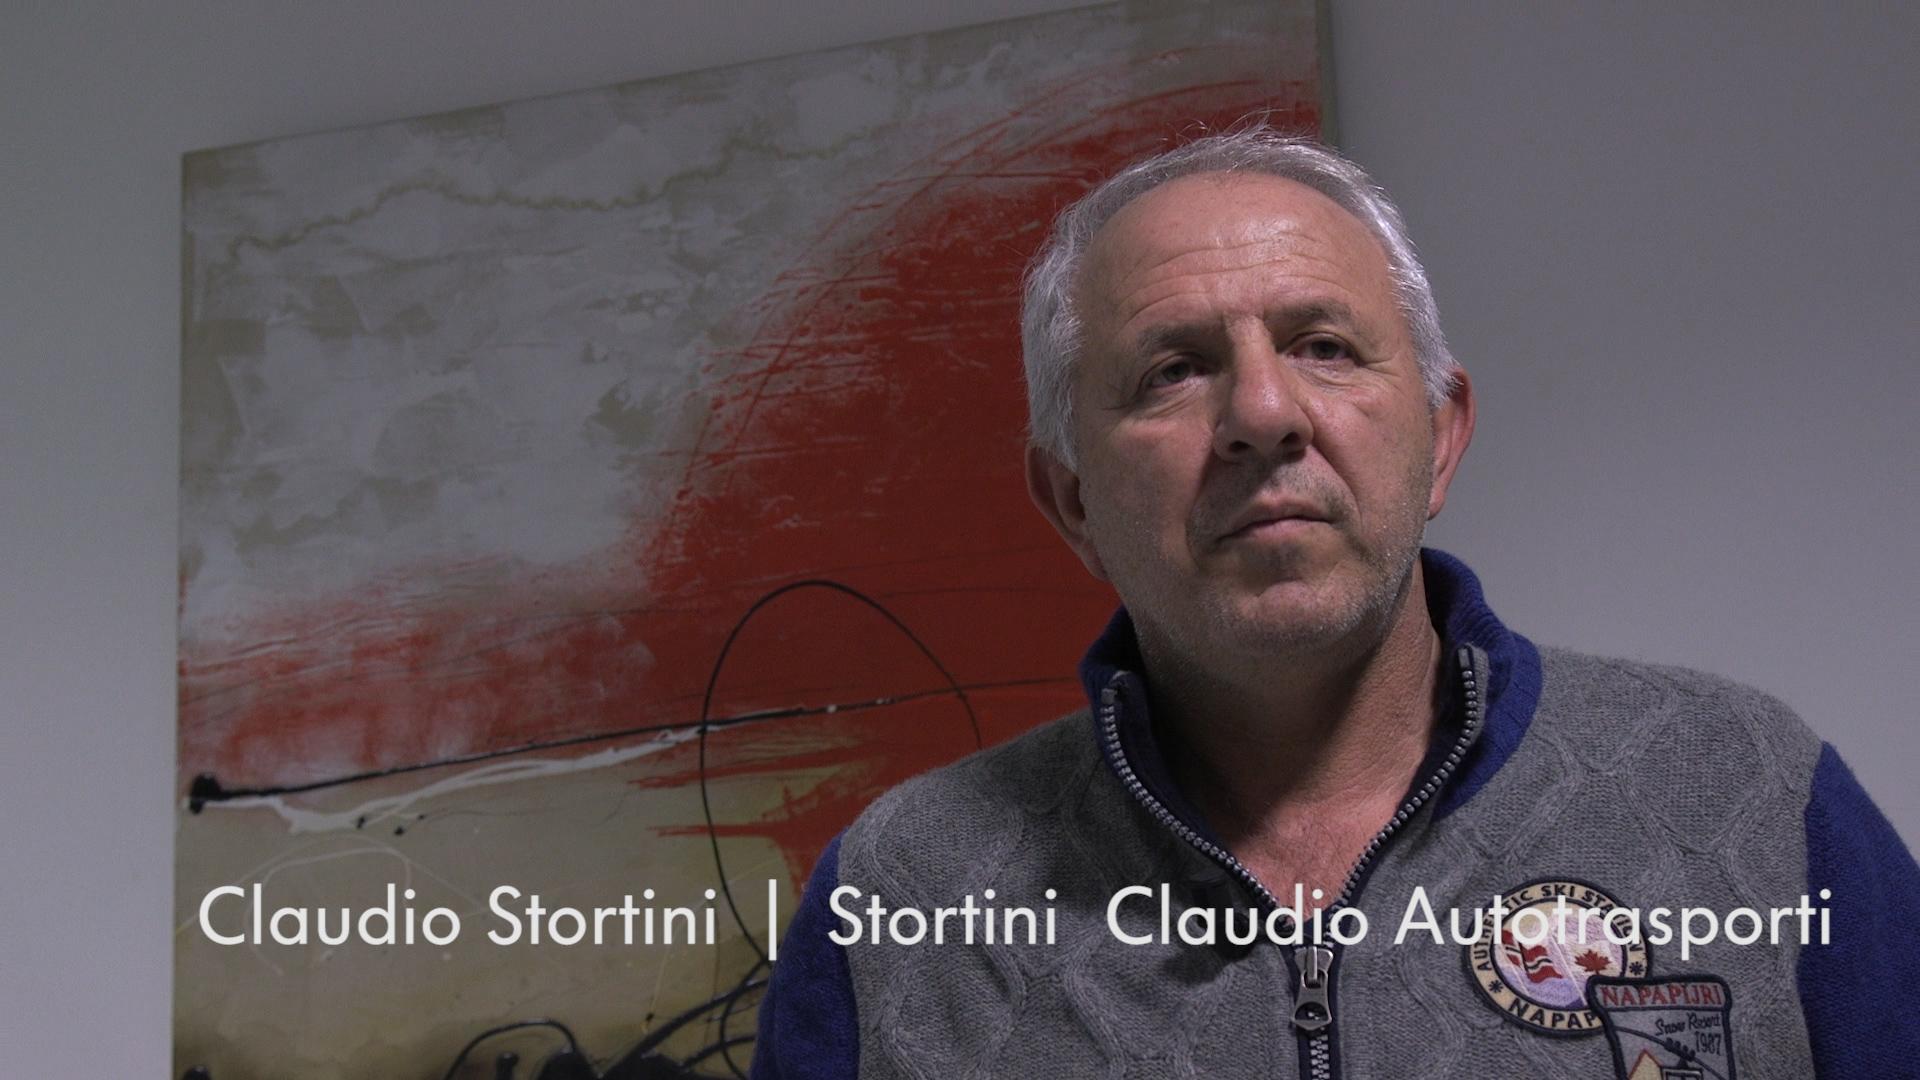 Claudio Stortini